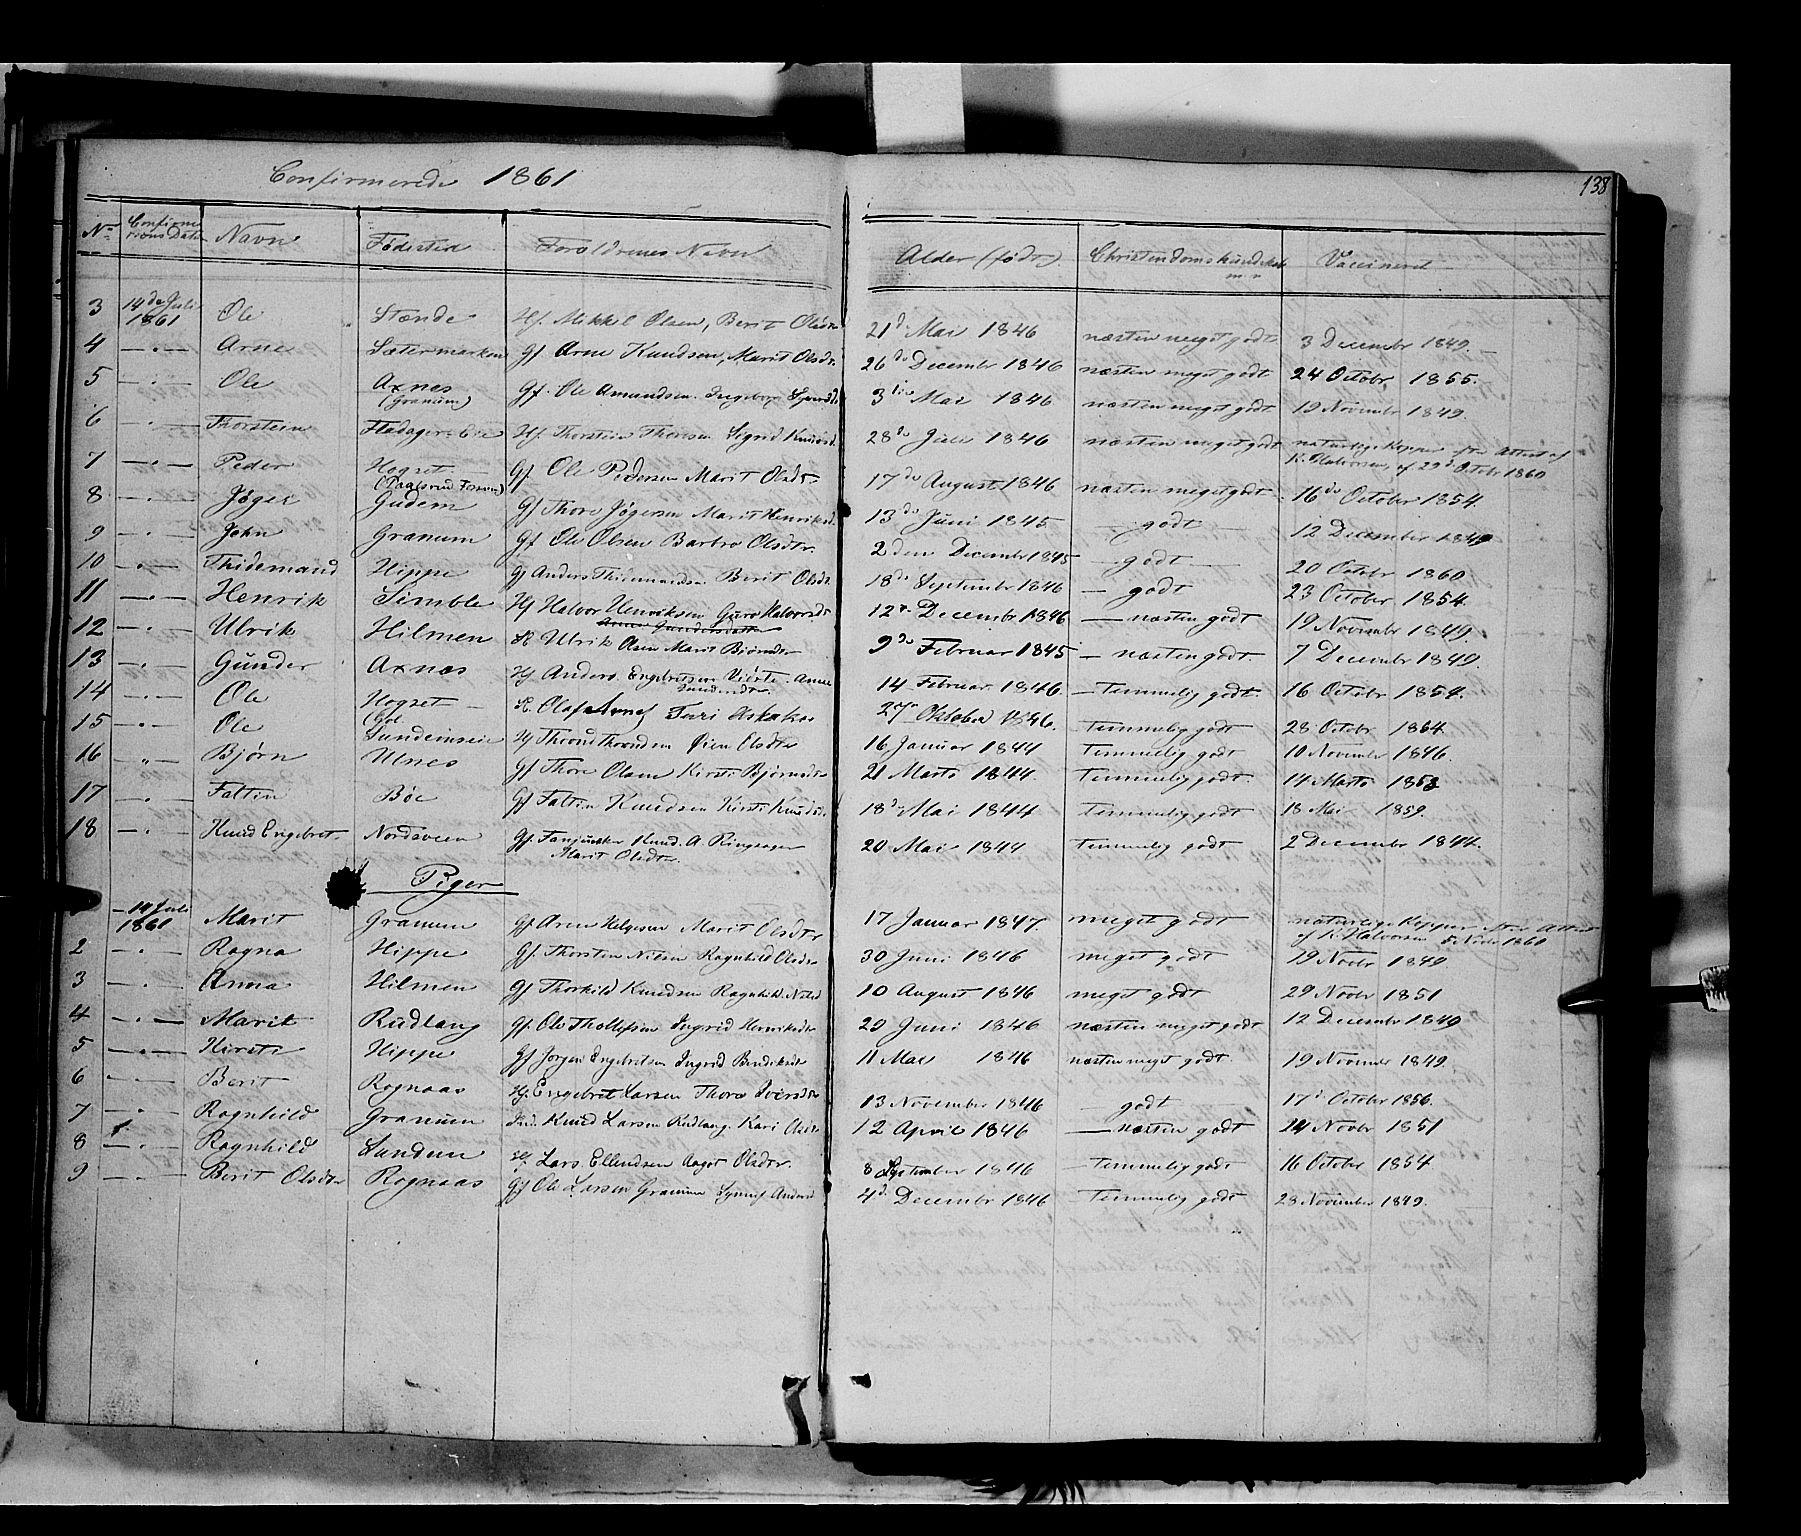 SAH, Nord-Aurdal prestekontor, Ministerialbok nr. 6, 1842-1863, s. 138